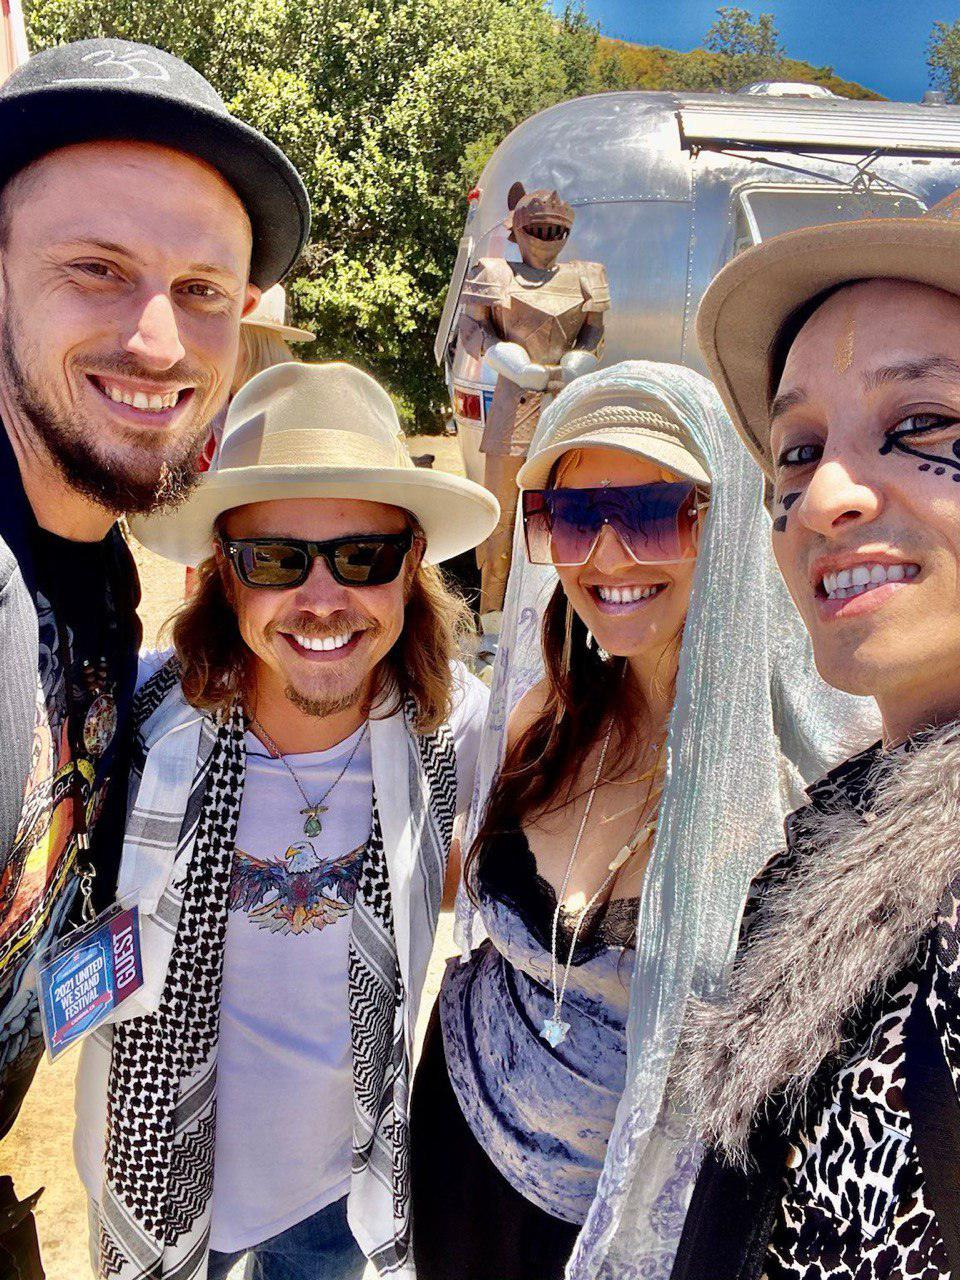 Brock Pierce, Justine Sophia, Nicholas Sun Dragon & Tsunami Diamond at United We Stand